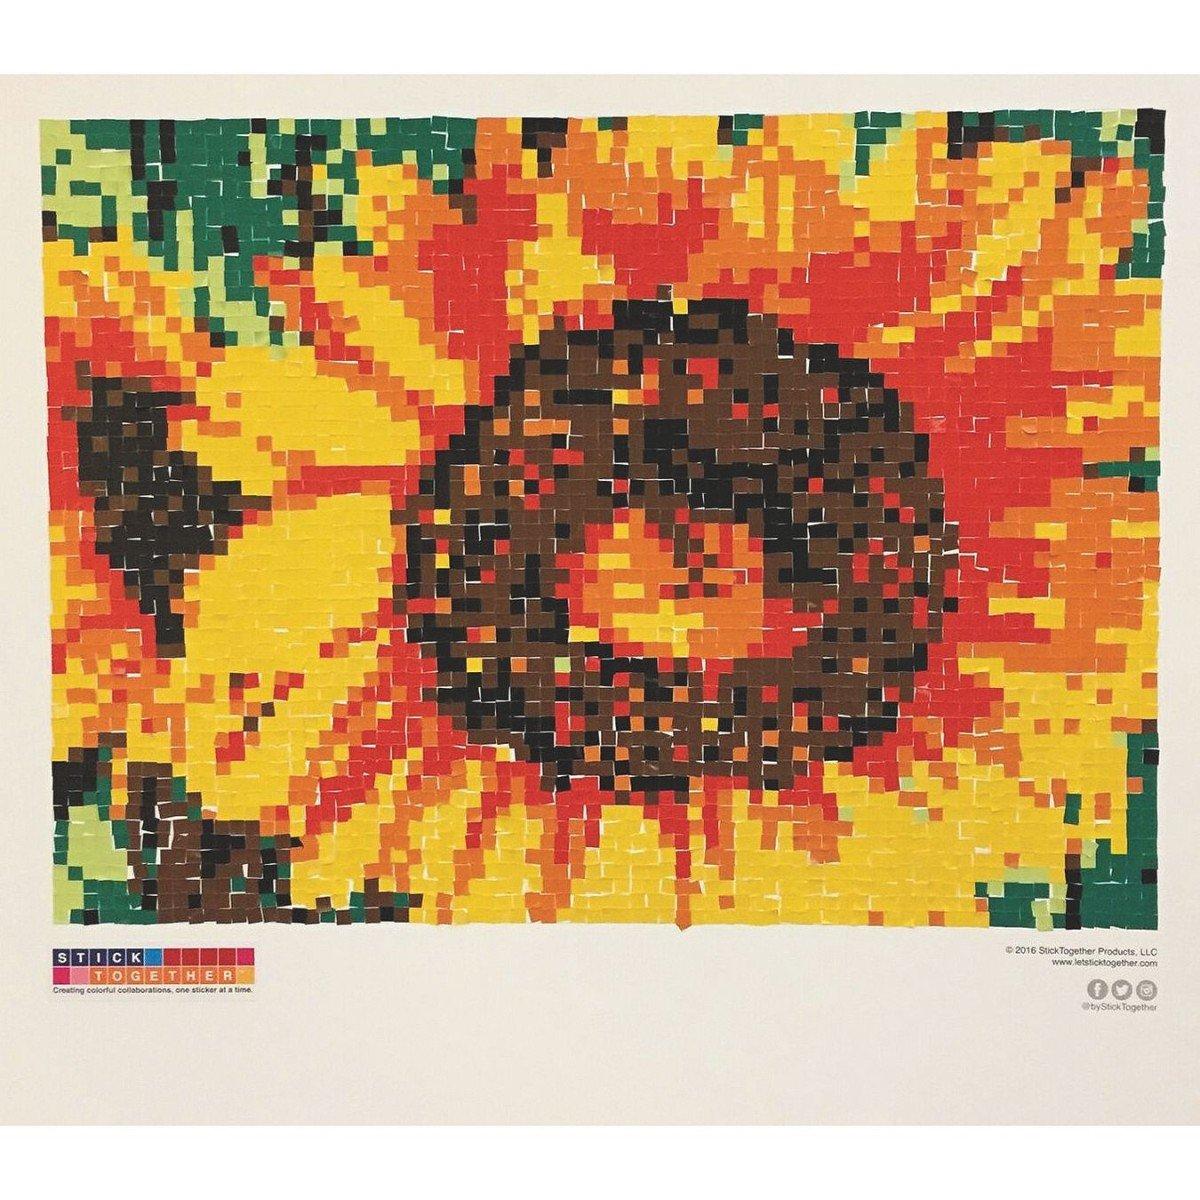 STICK TOGETHER Sunflower Collaborative Sticker Mosaic